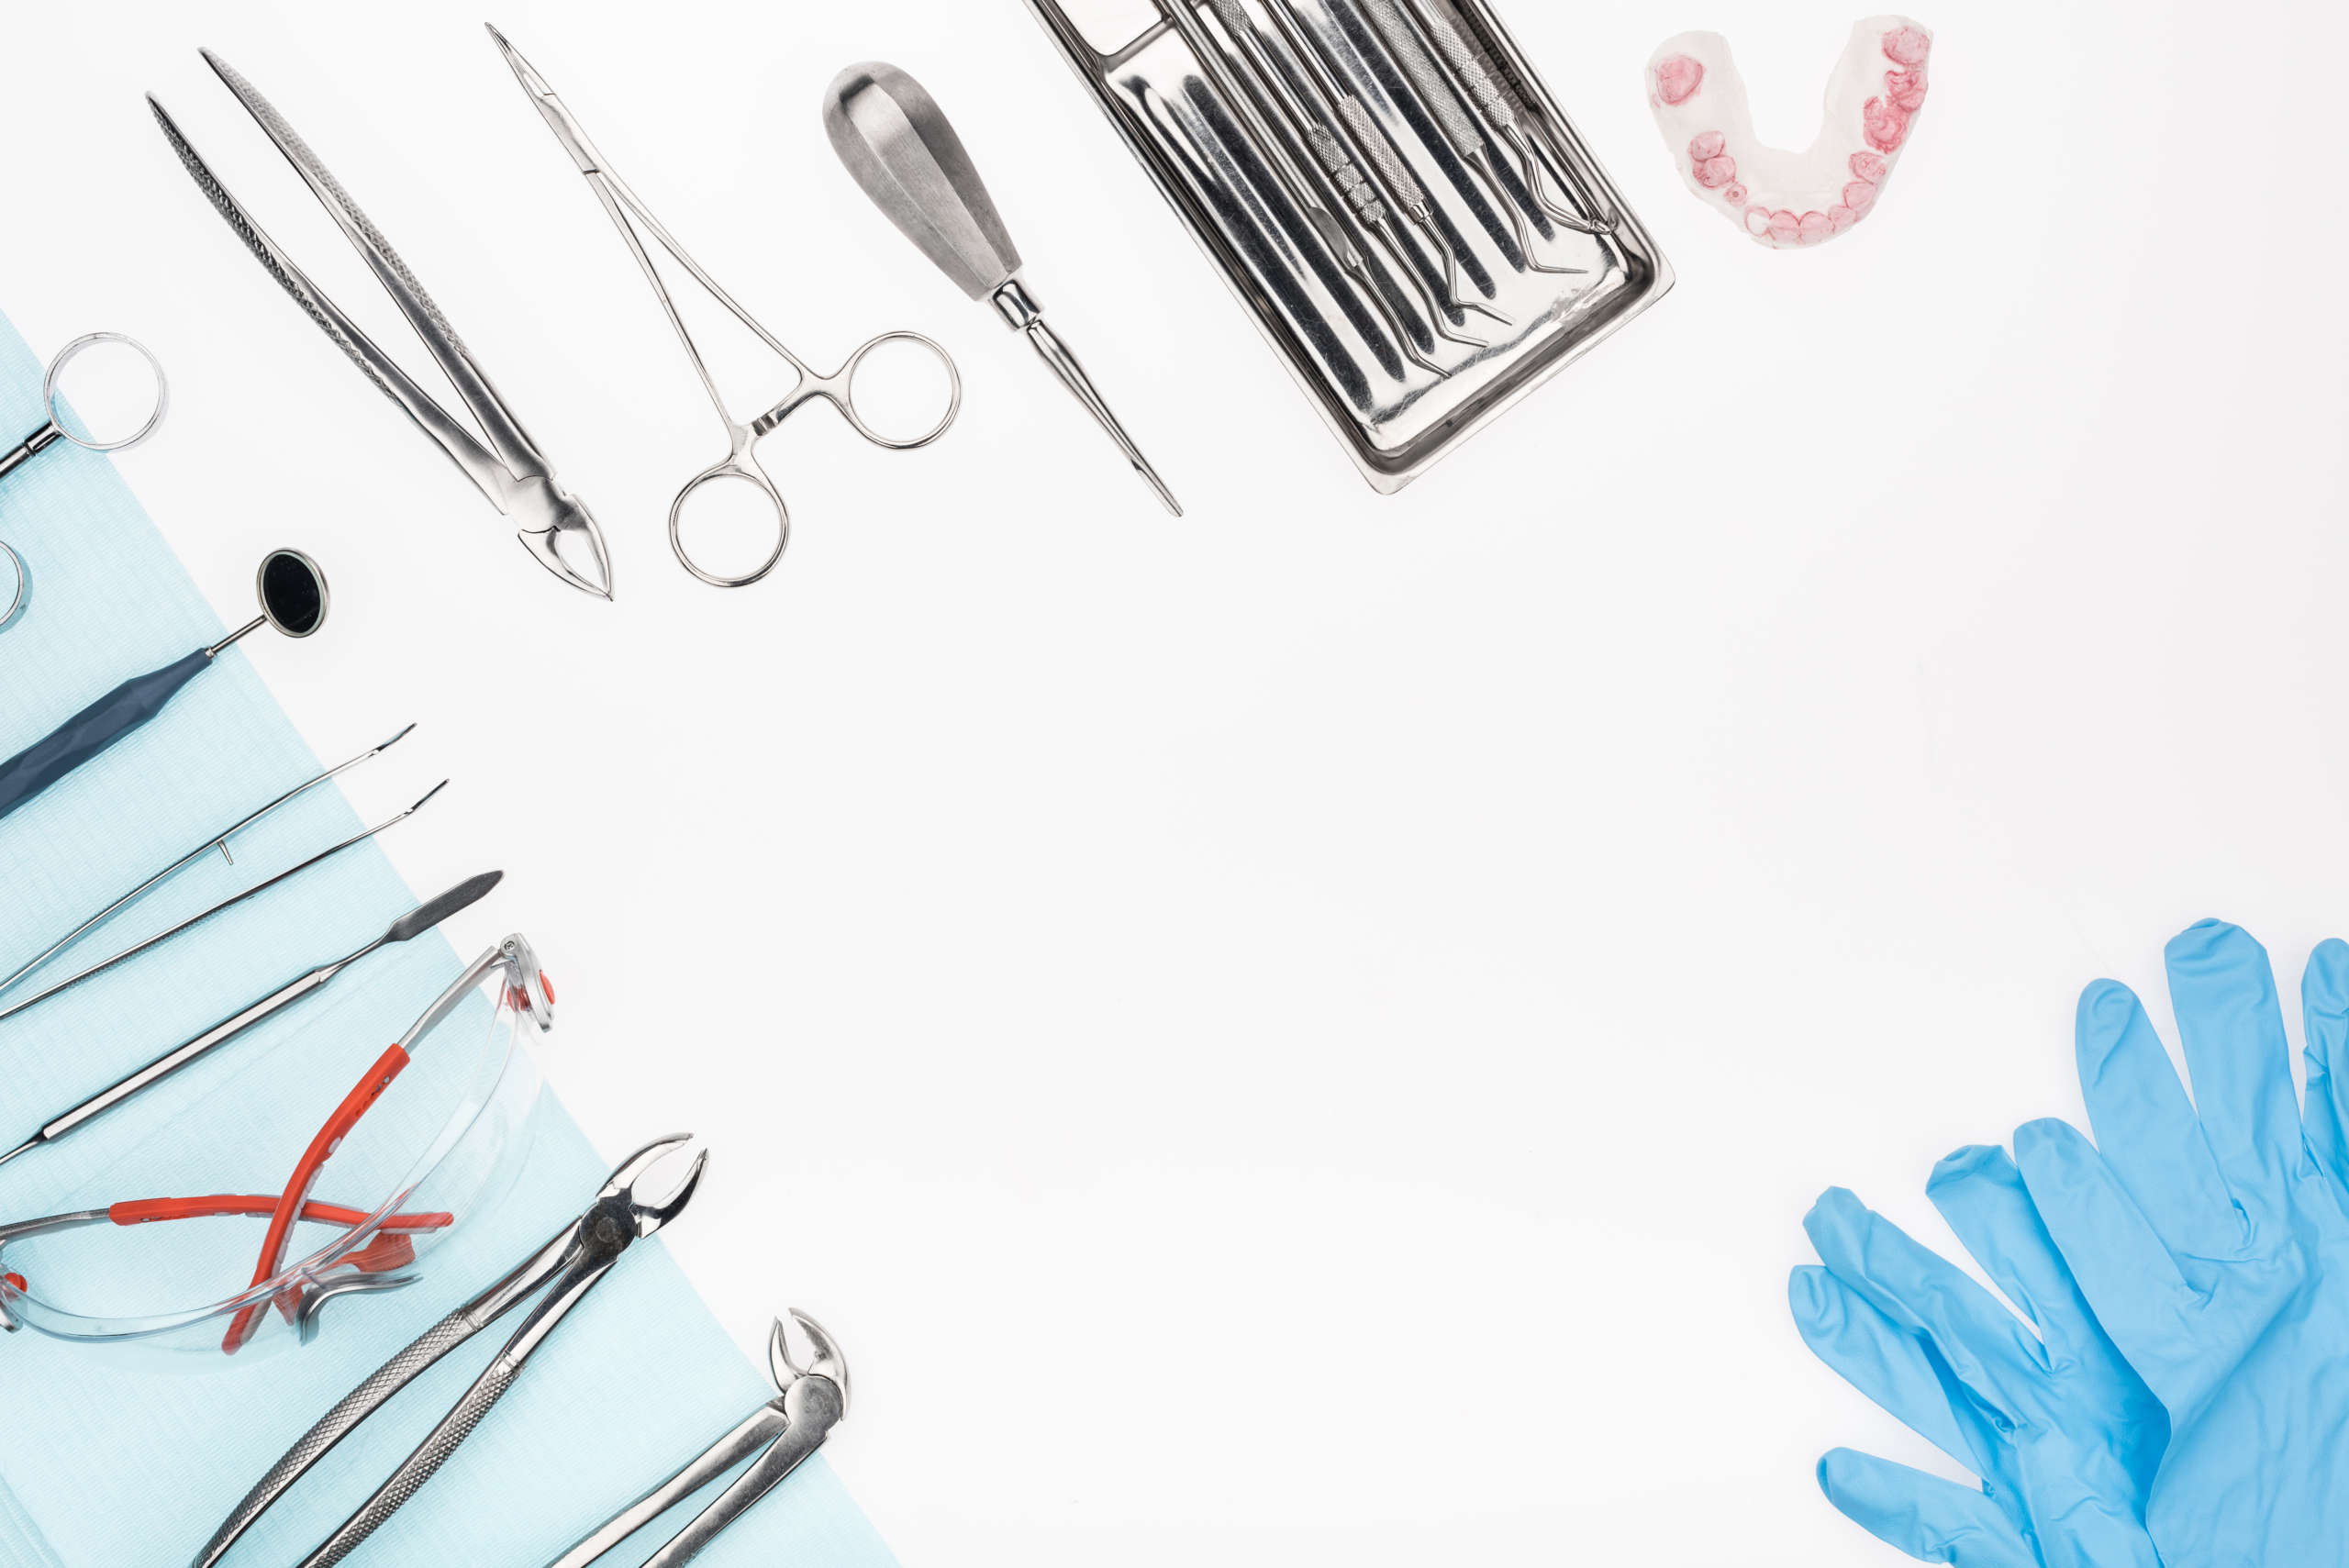 Extrakcia zubu | Trhanie zubu | MDDr. Andrea Hrubá